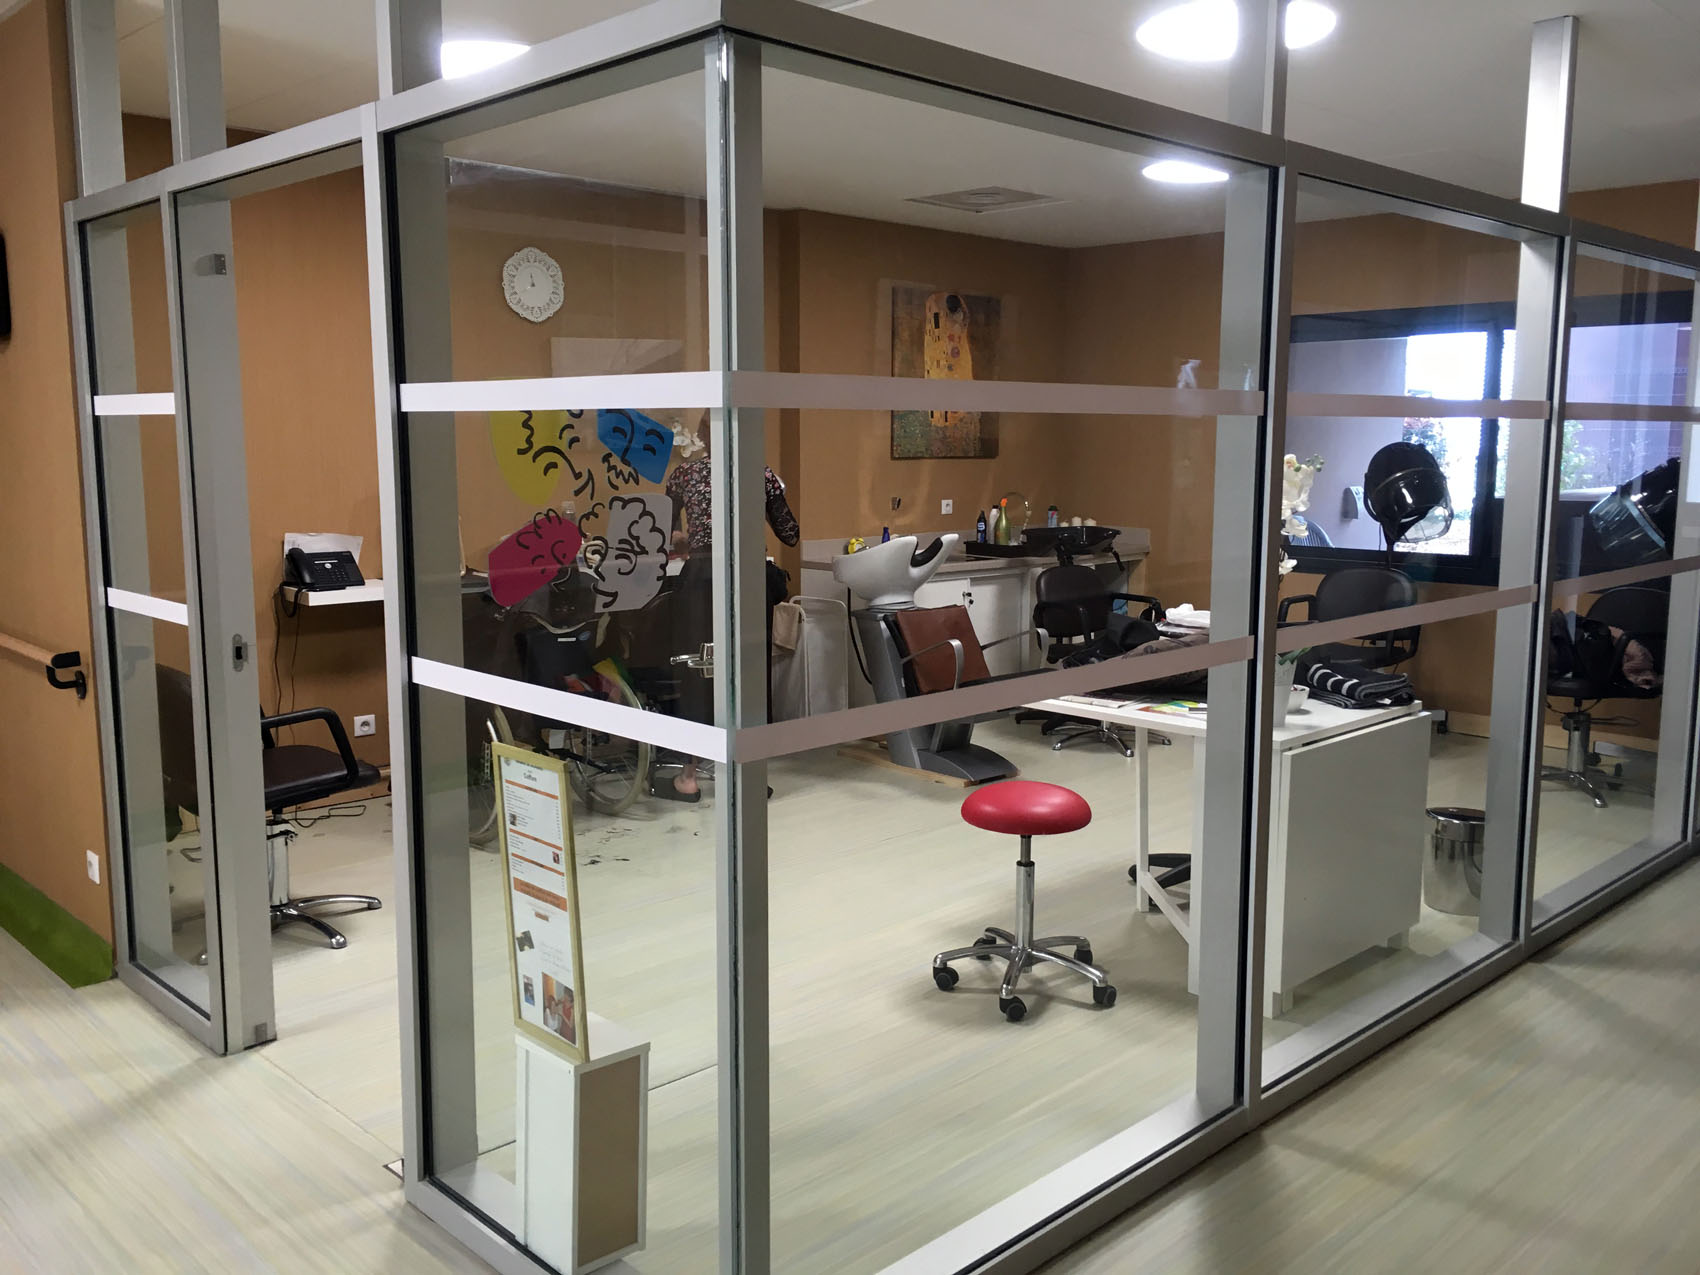 Les Girondines - Salon de coiffure